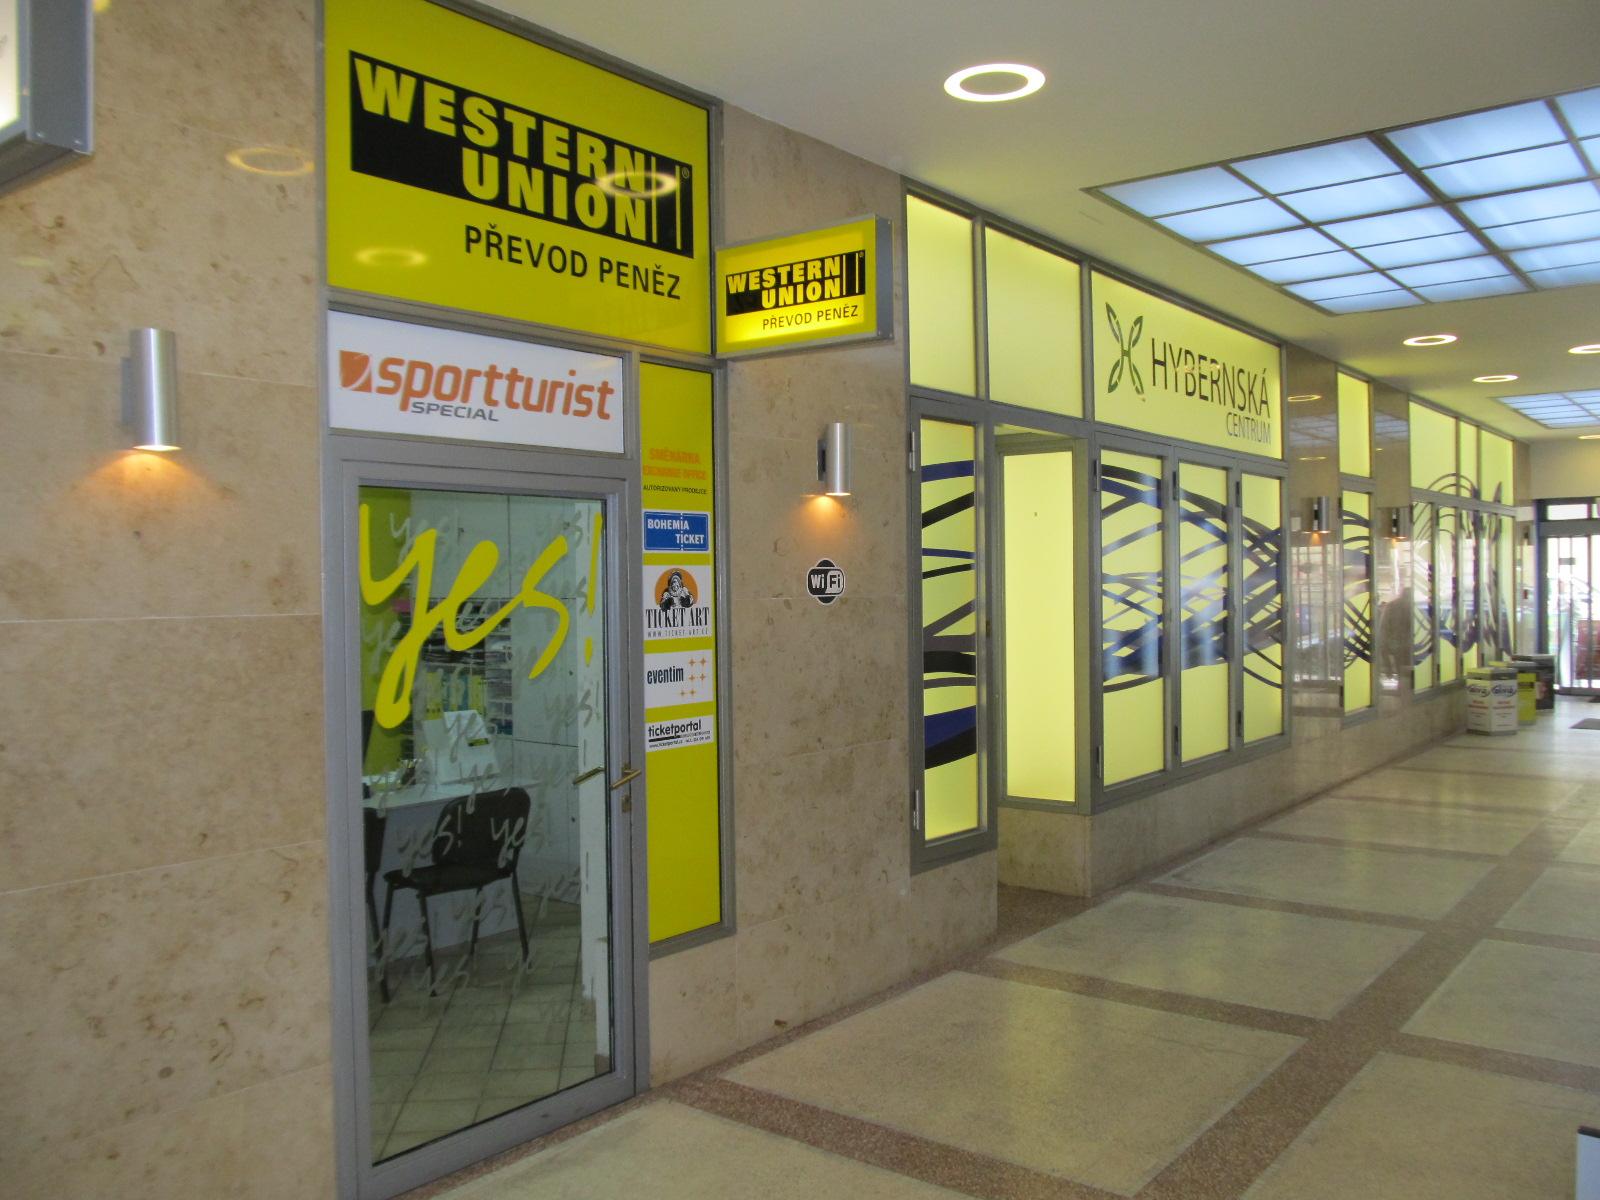 Ticketportal Ticket Office Western Union Prague The Czech Republic